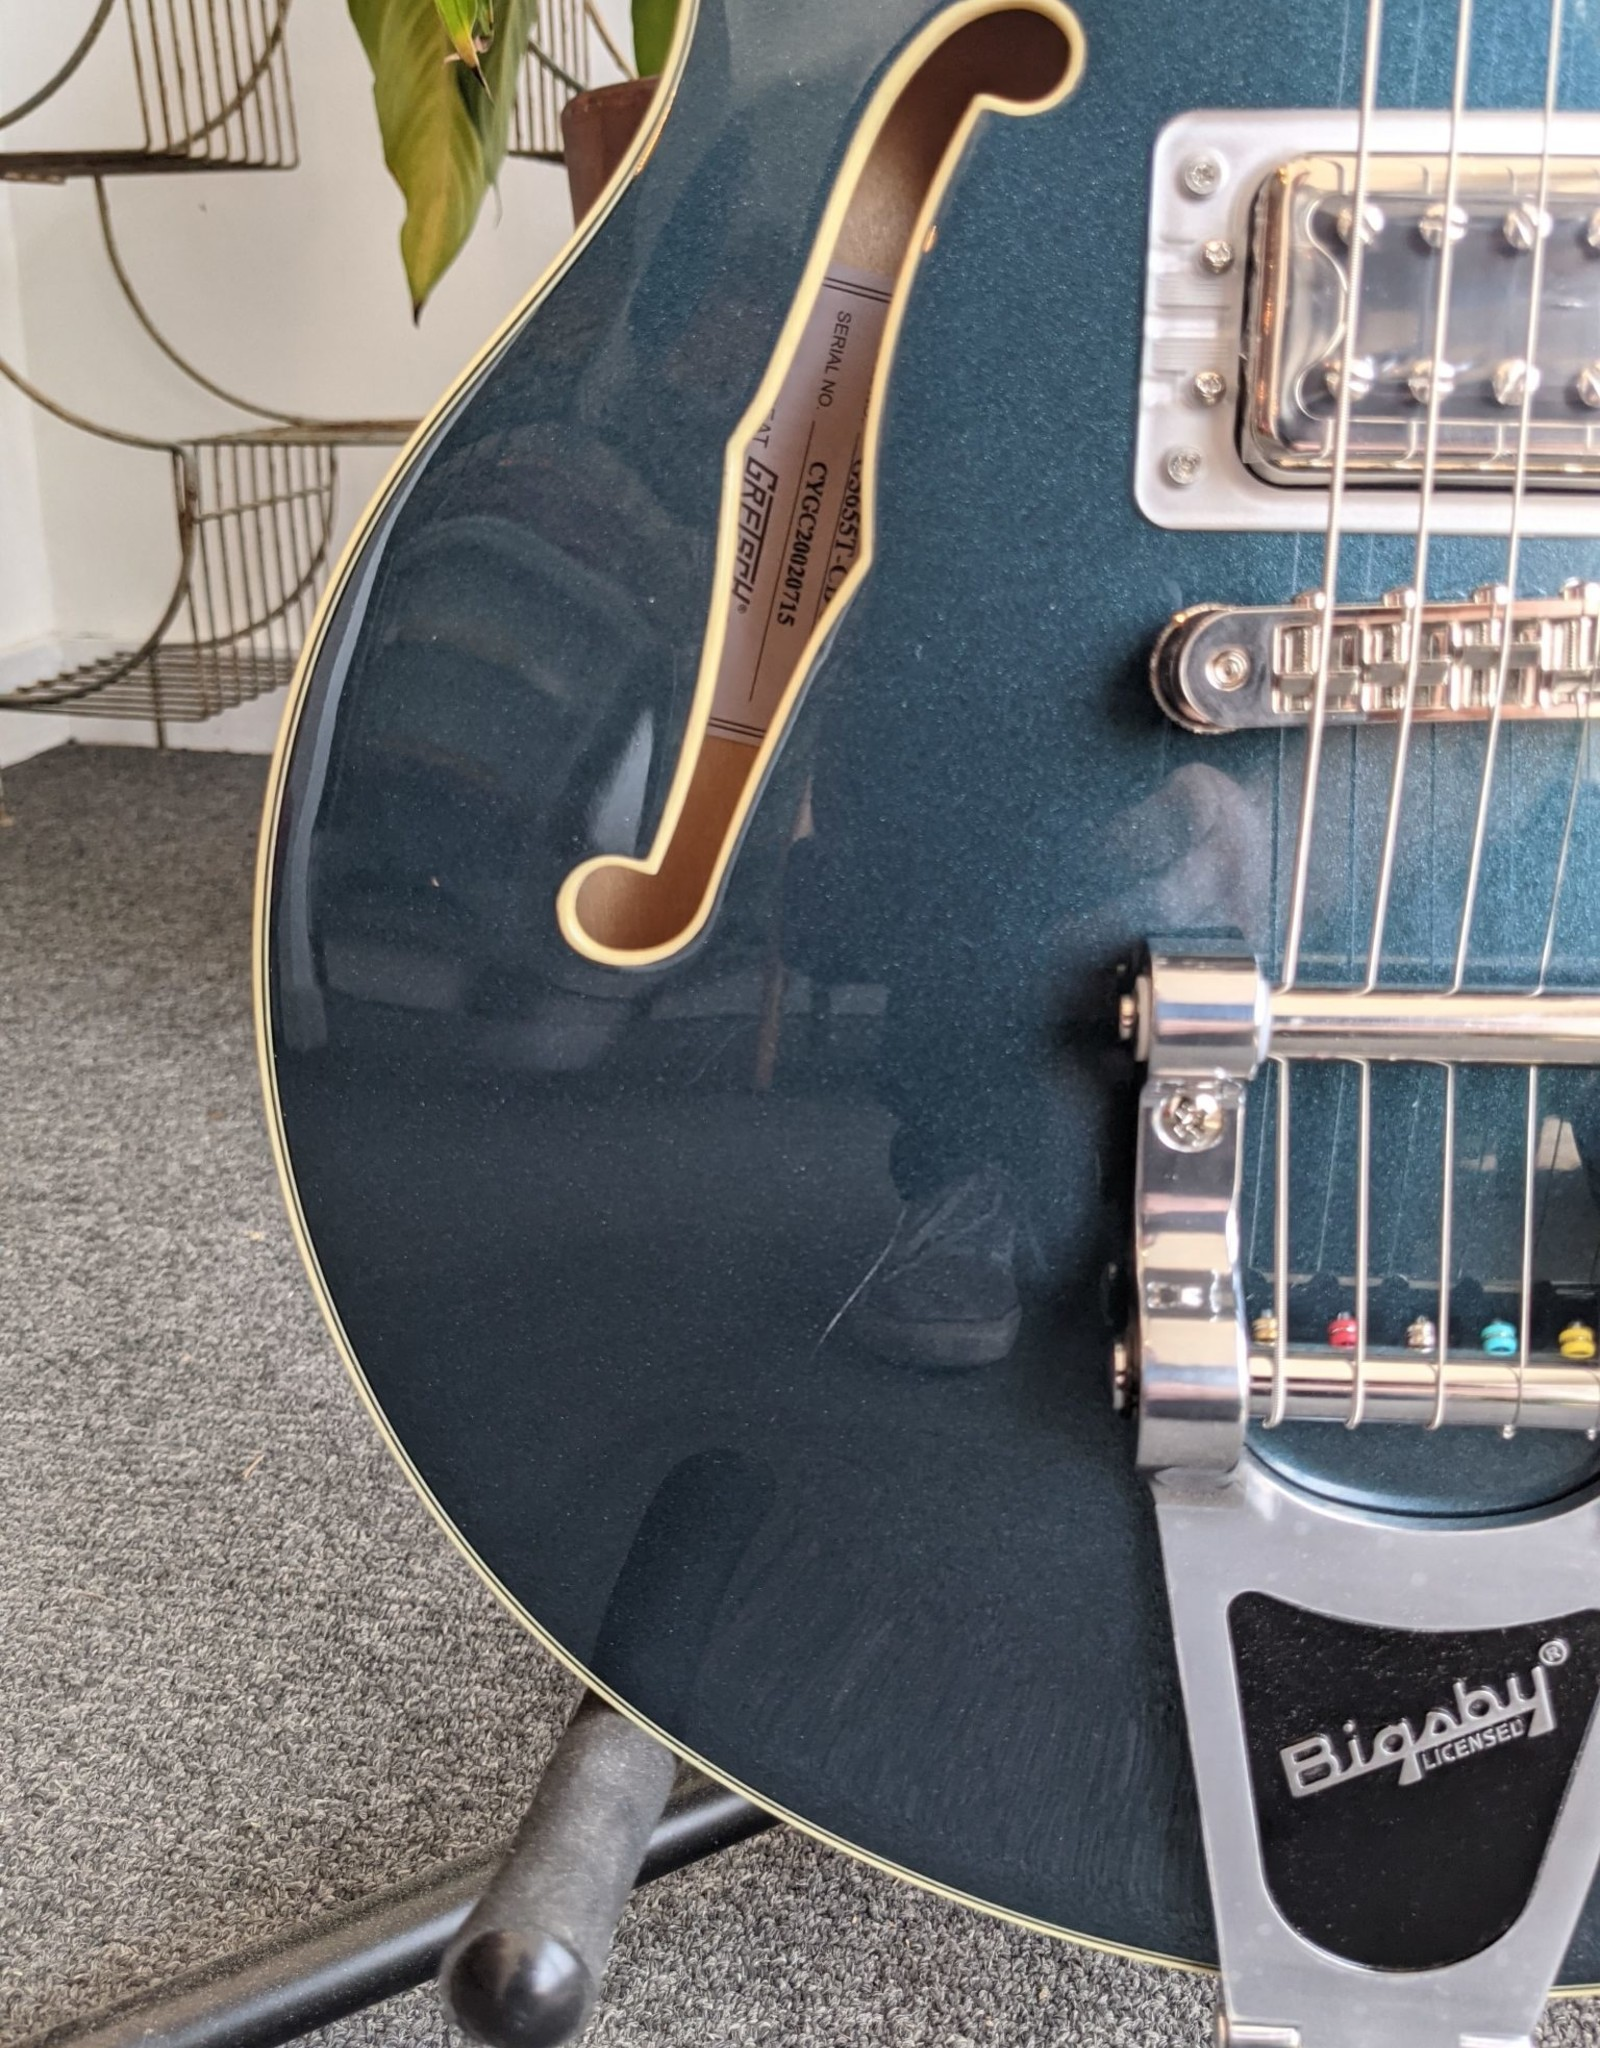 Gretsch Gretsch G5655T Electromatic Center Block Jr. Single-Cut with Bigsby, Jade Grey Metallic w/ HSC